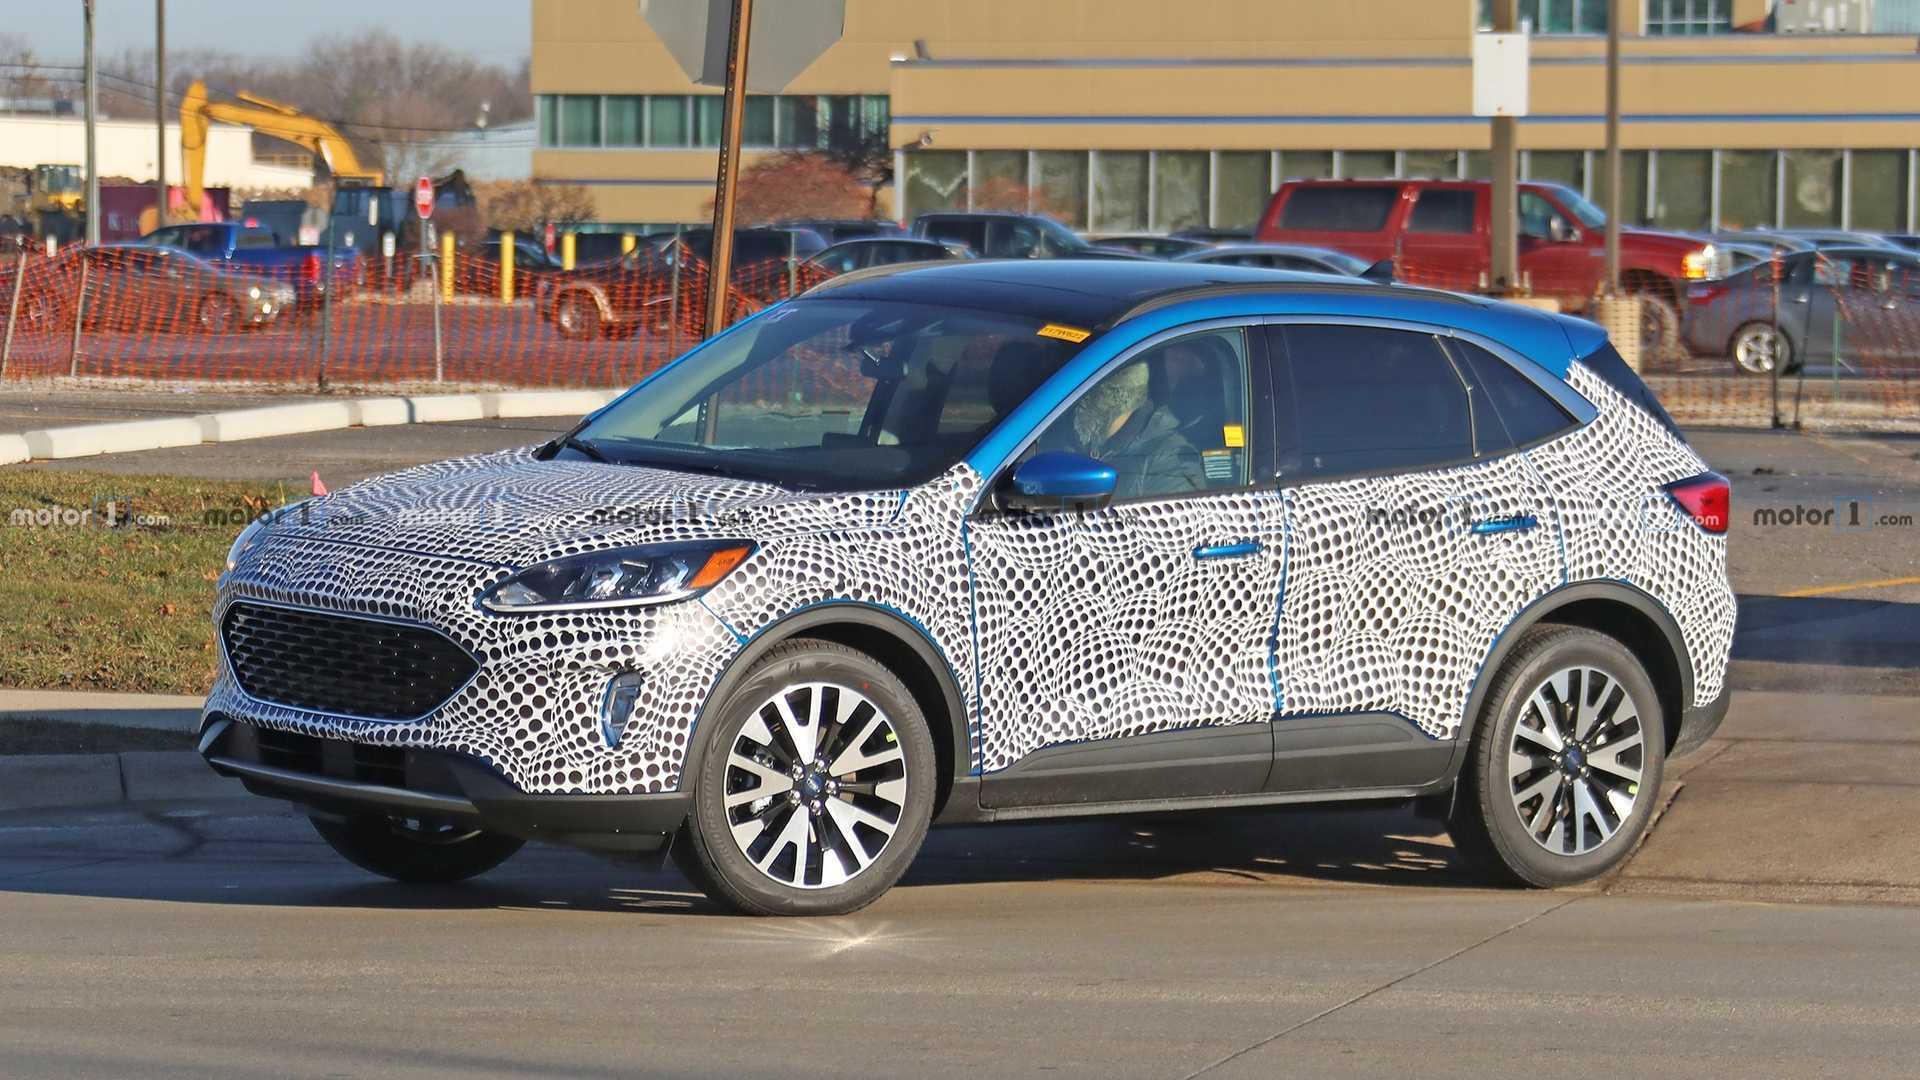 Neues Ford Suv Soll Noch 2019 Starten